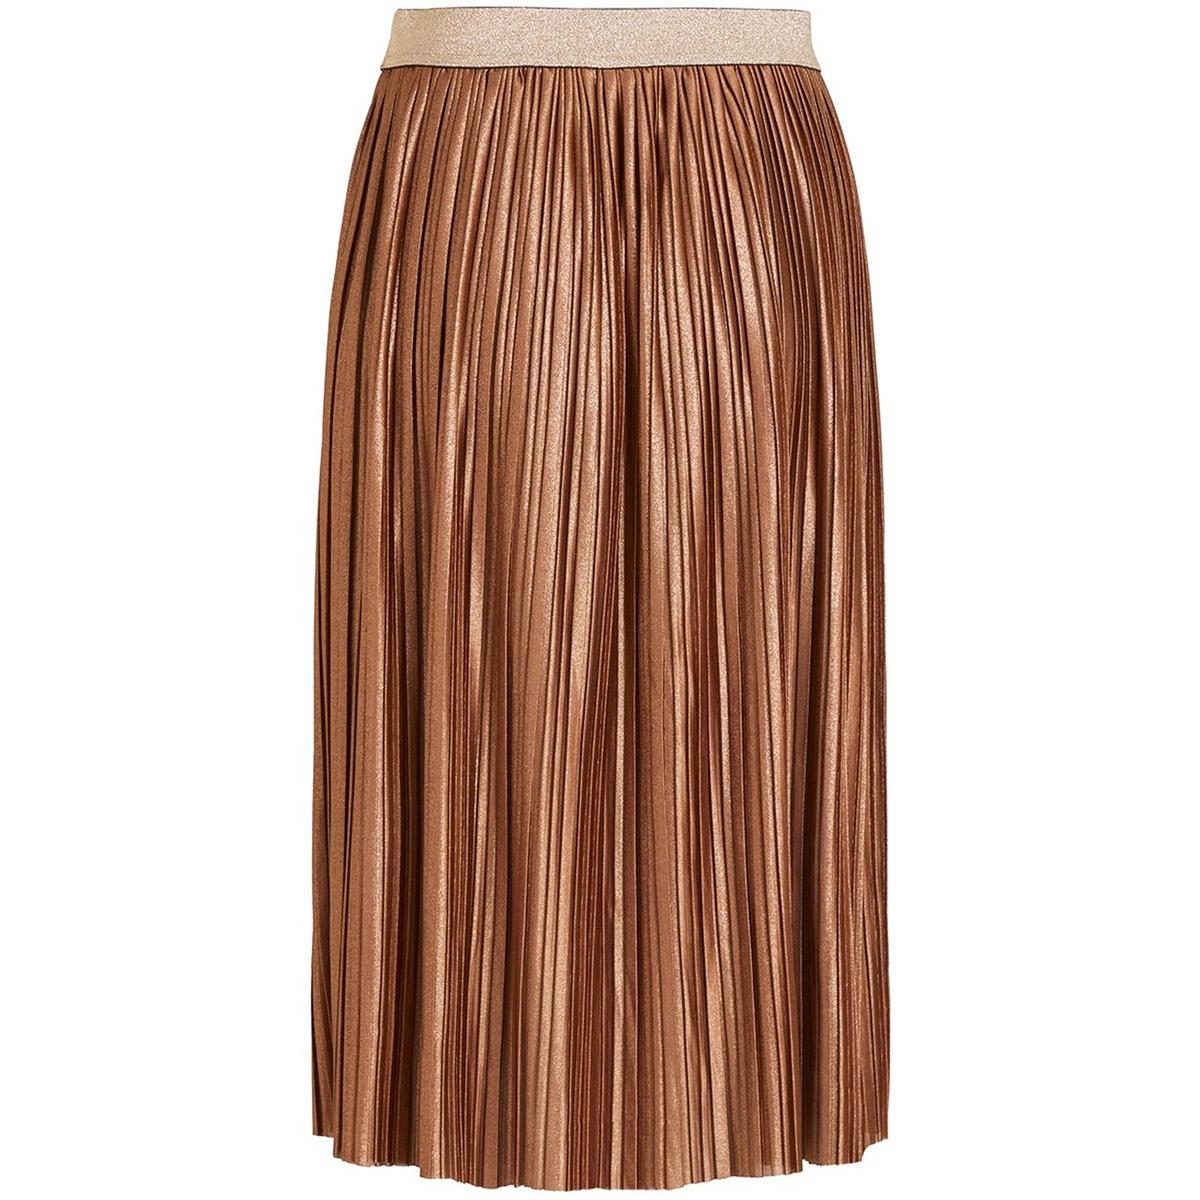 vikajsa midi skirt/des 14055009 vila rok toffee/w. copper